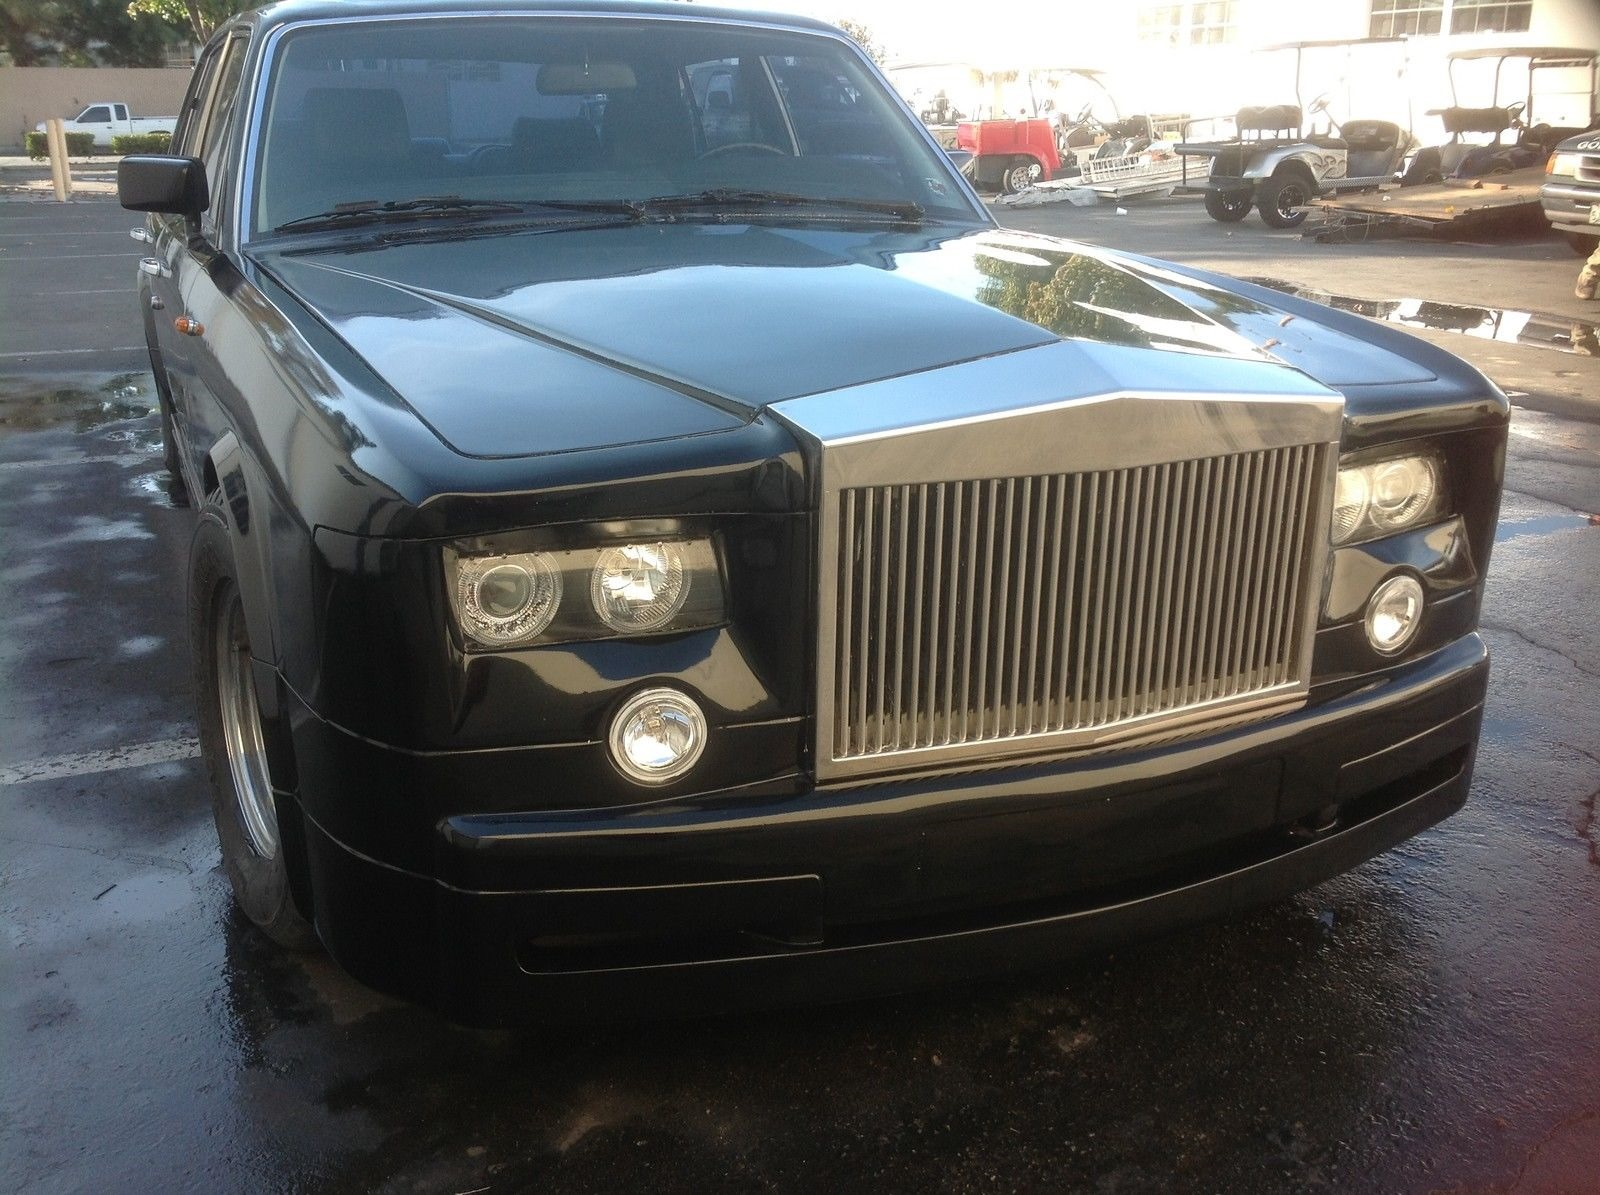 Bentley-Phantom-8%25255B2%25255D.jpg